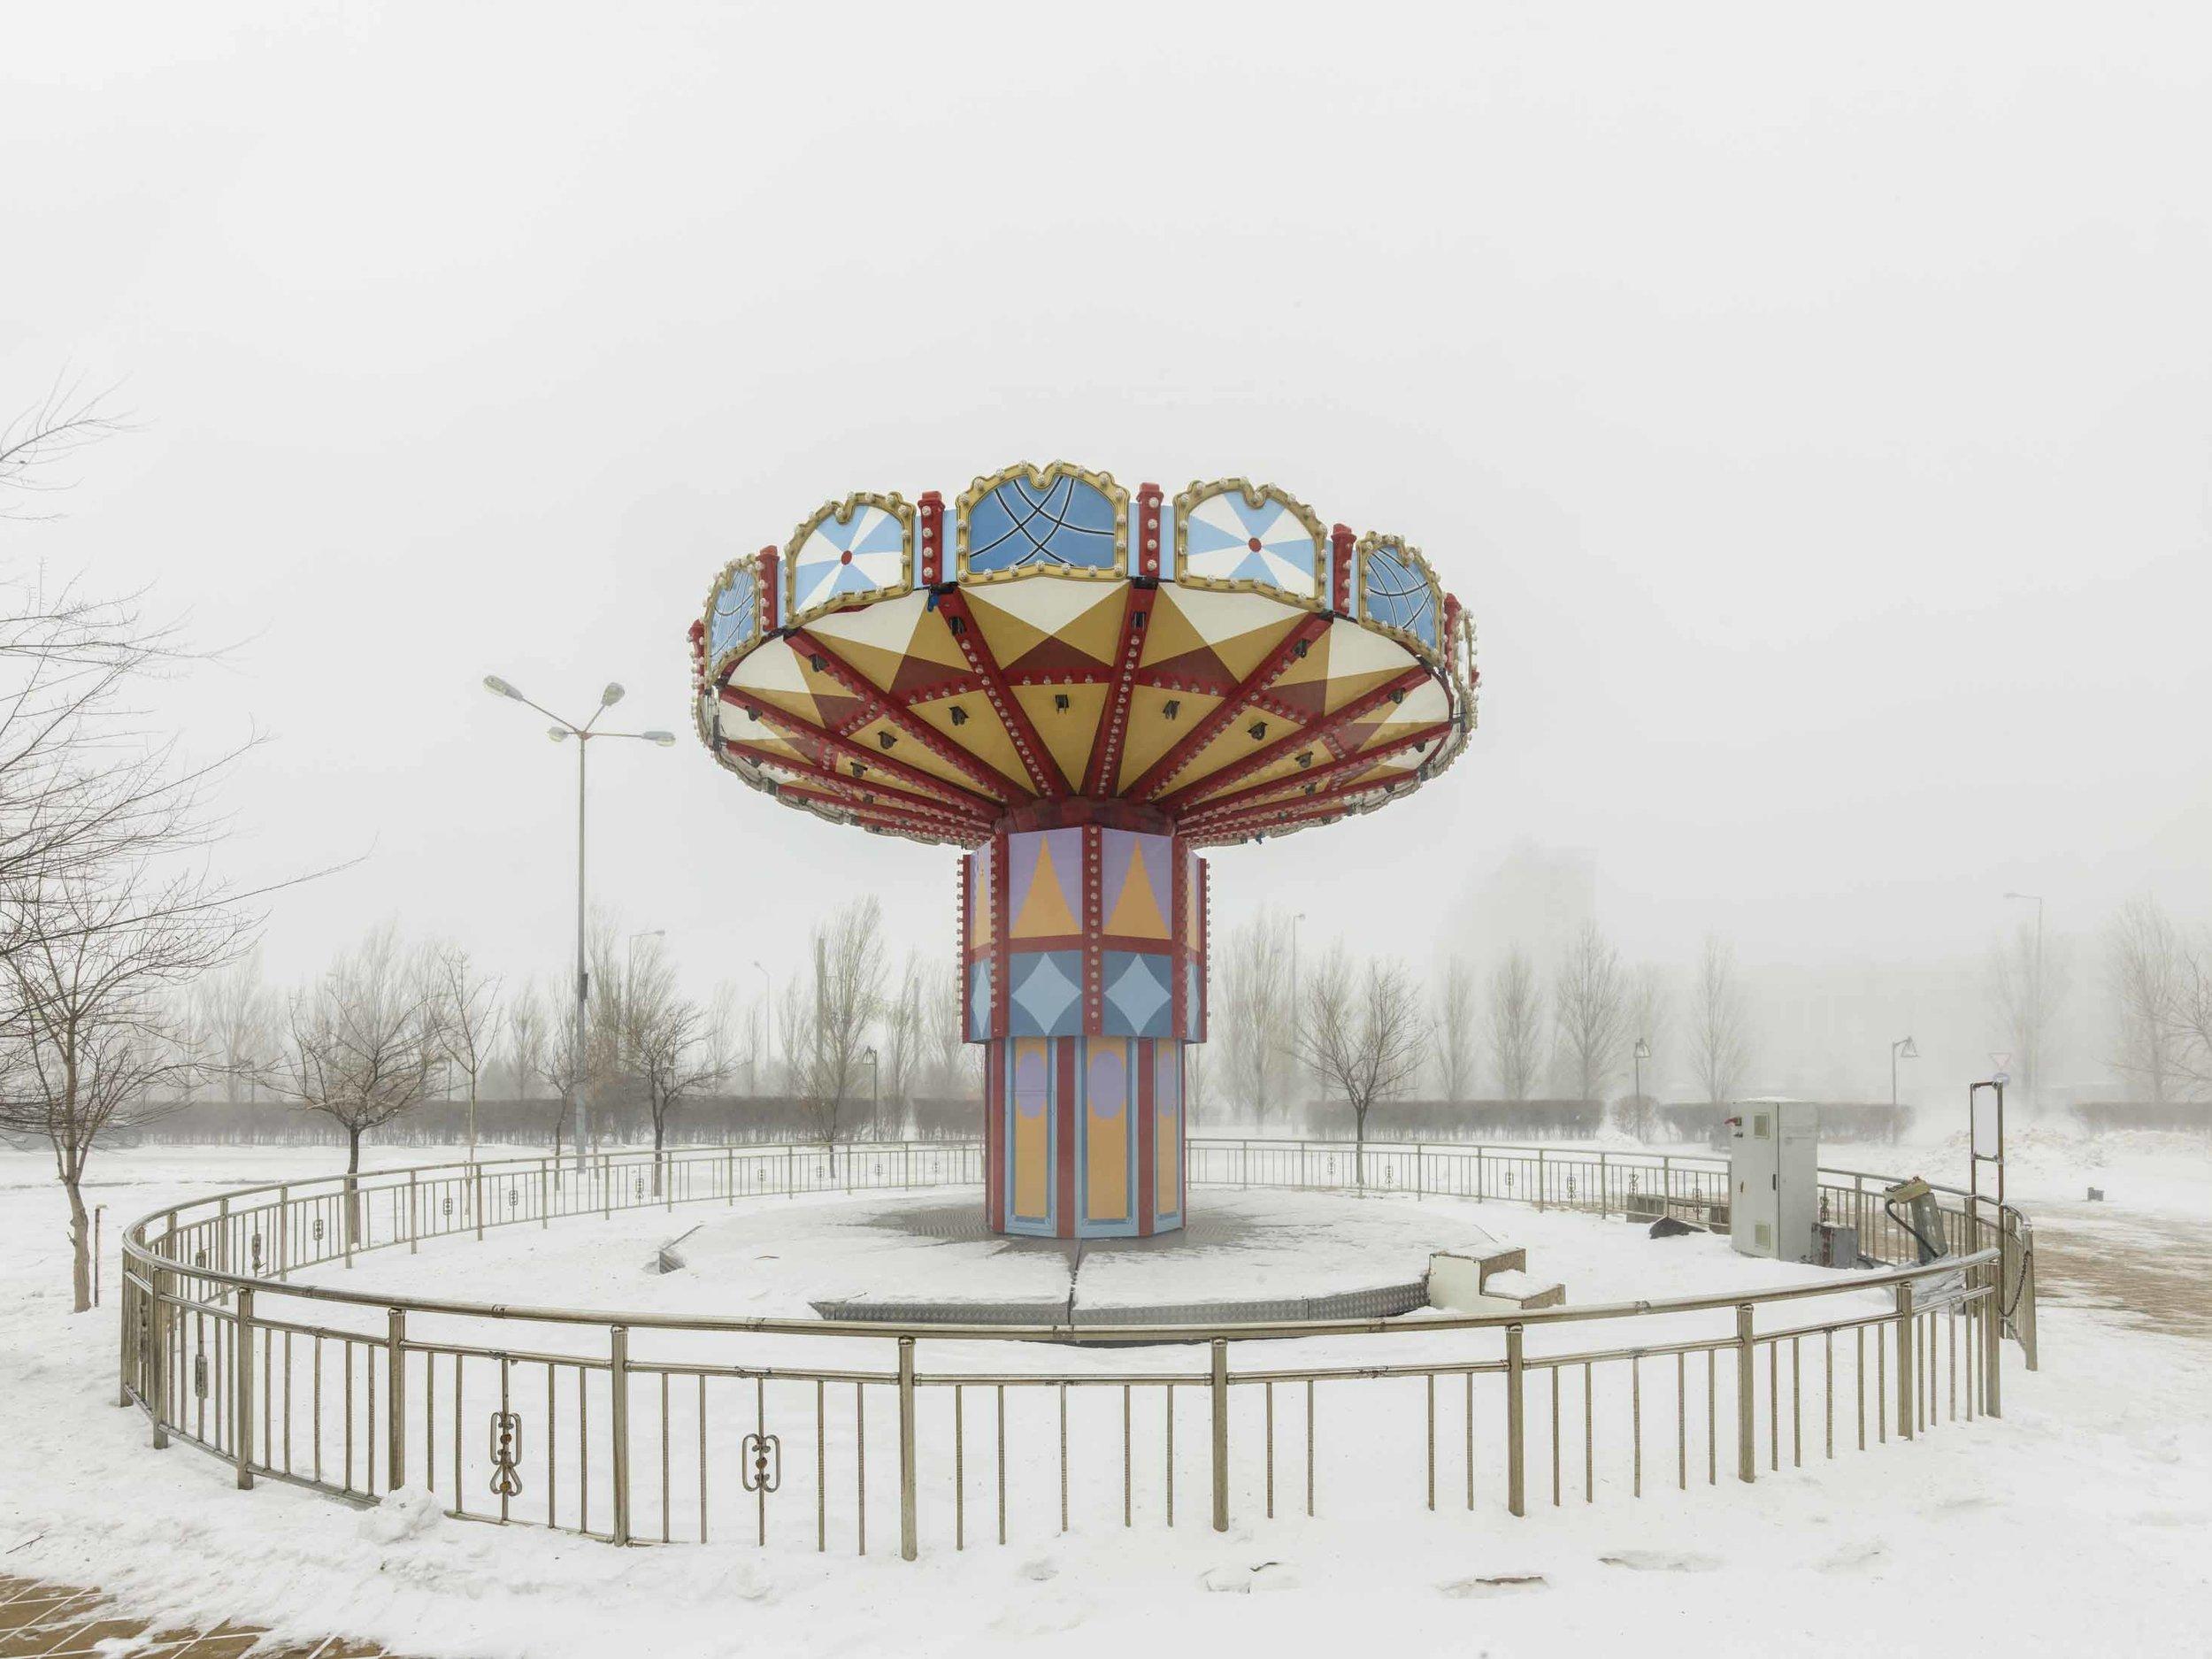 photography-artwork-collection-jordi-bernado-Astana.jpg